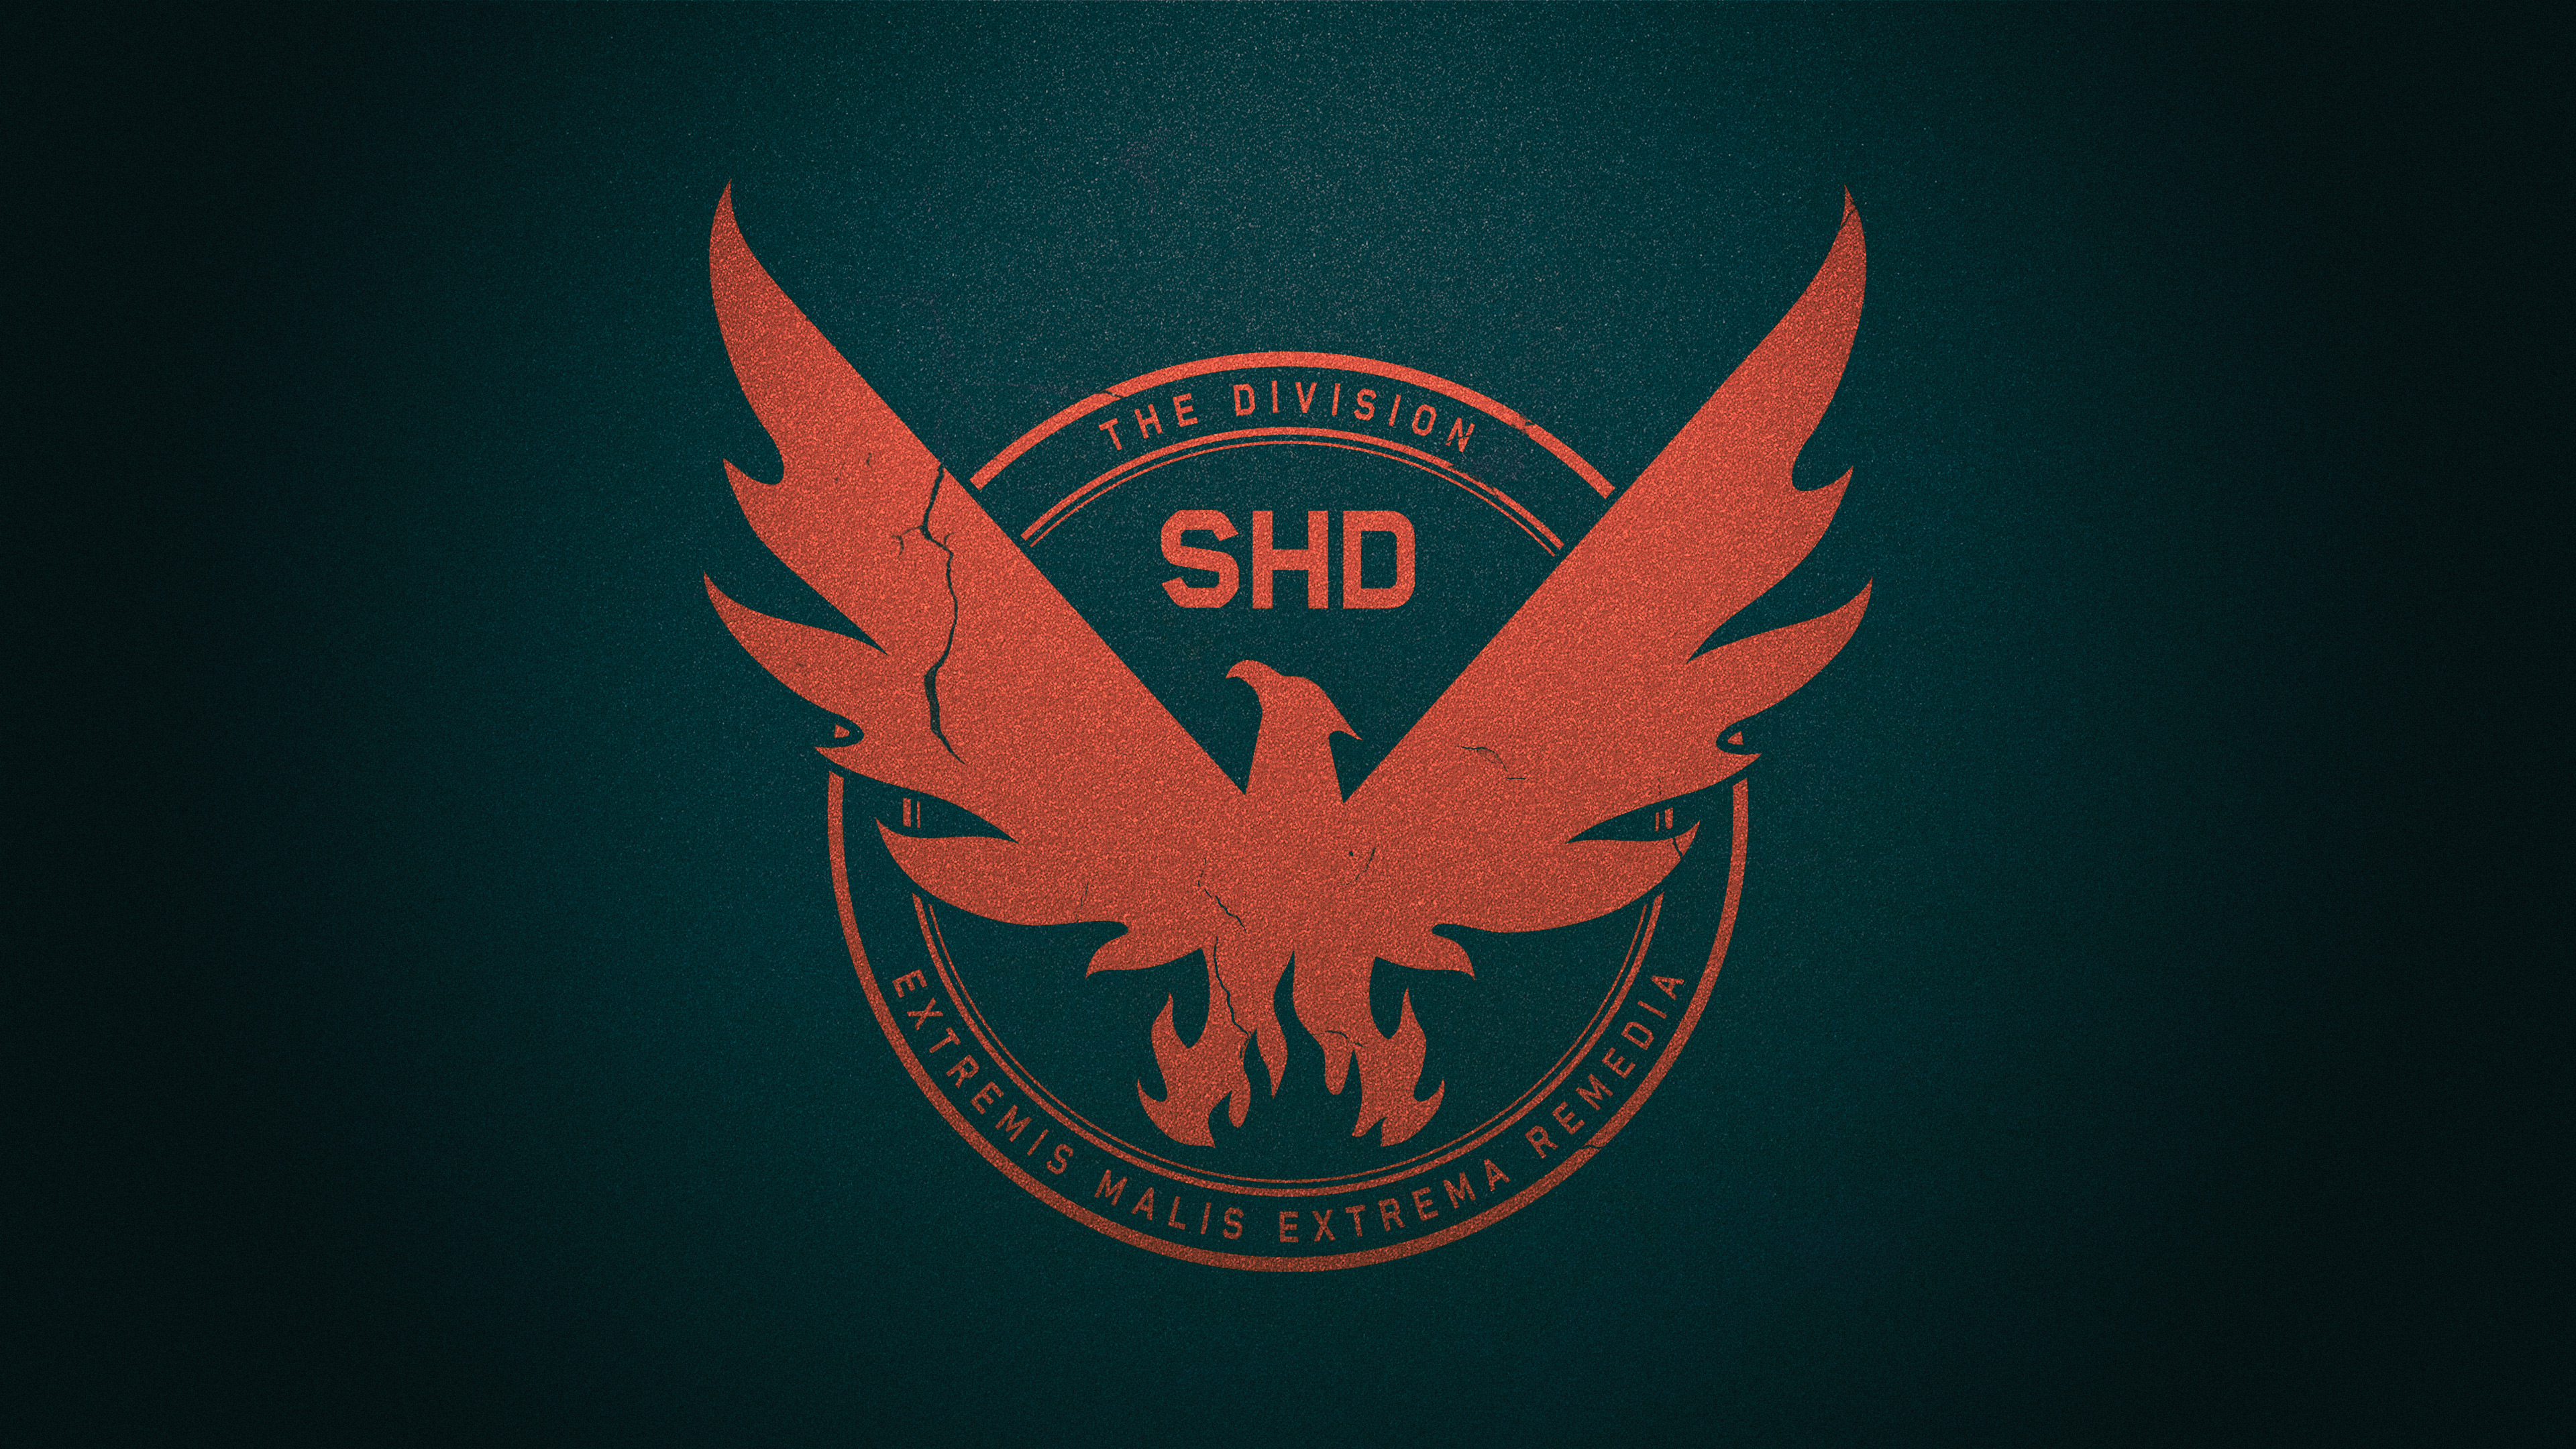 The Division 2 Phoenix 4k Wallpaper Hd Games 4k Wallpapers